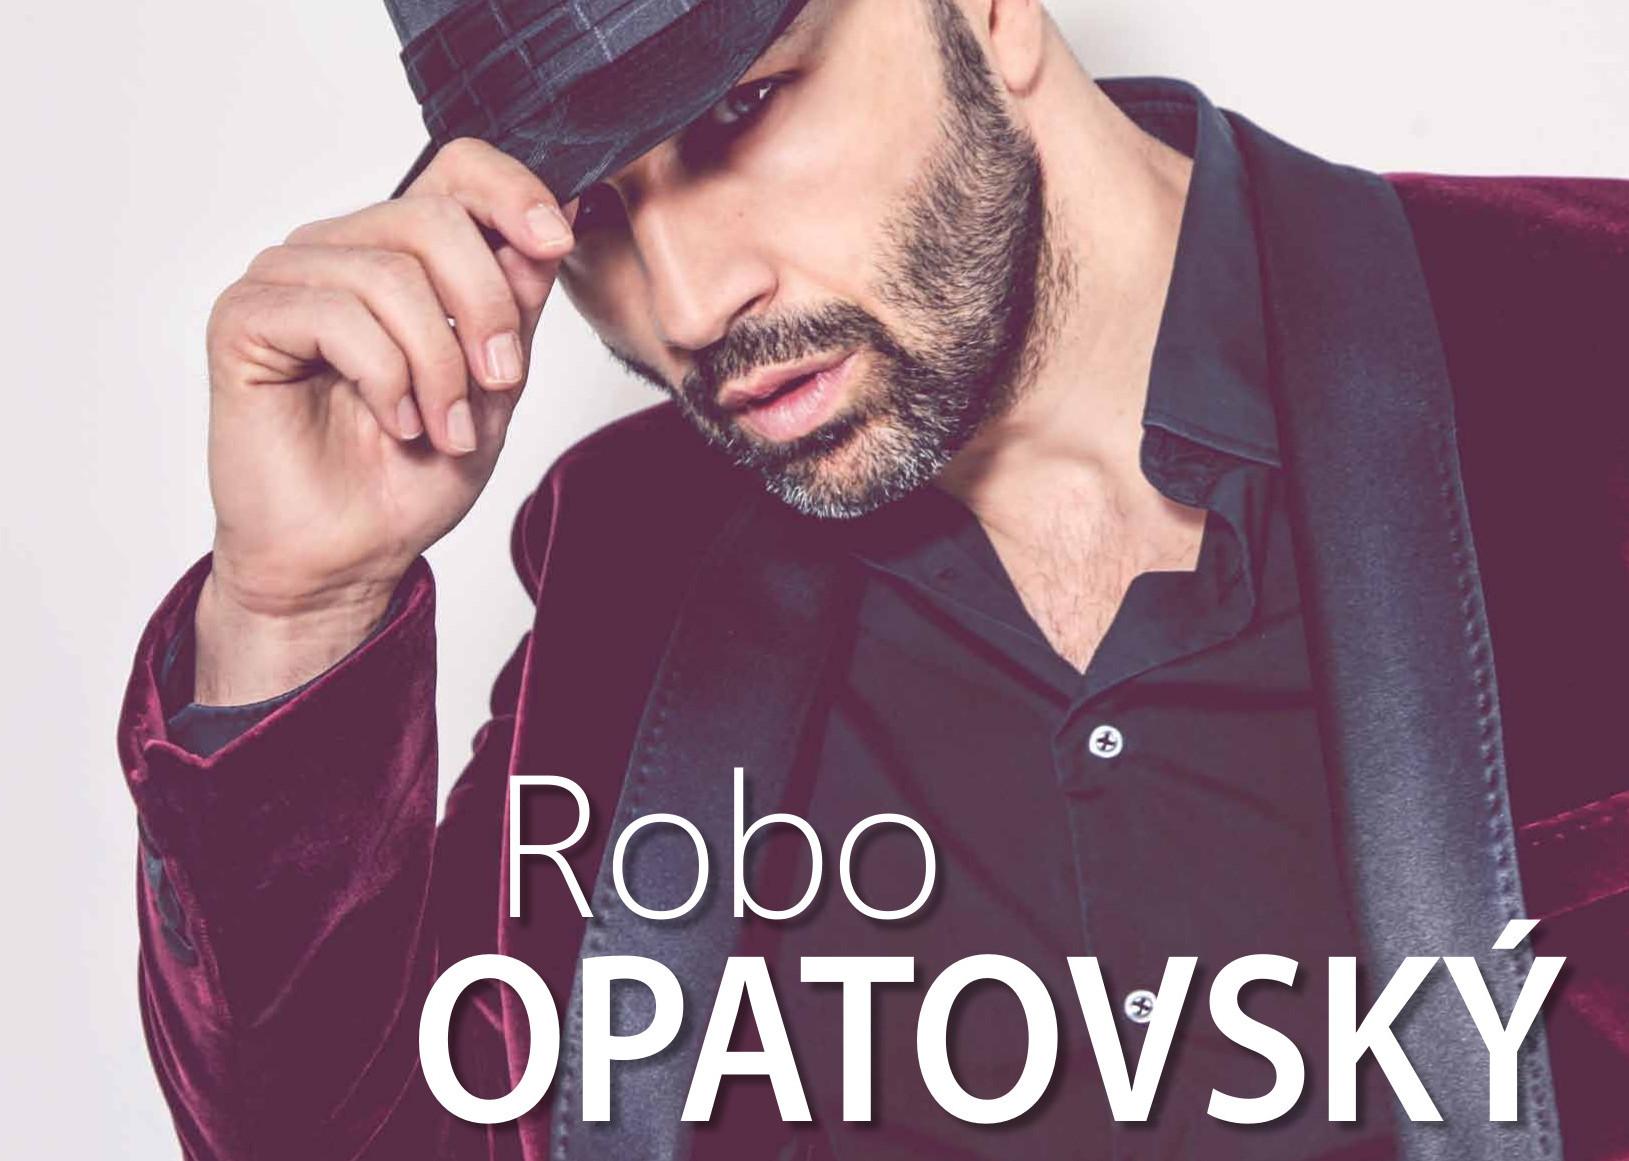 62a0e17ff663 ROBO OPATOVSKÝ UNPLUGGED TOUR 2017 už čosk - Kam v meste